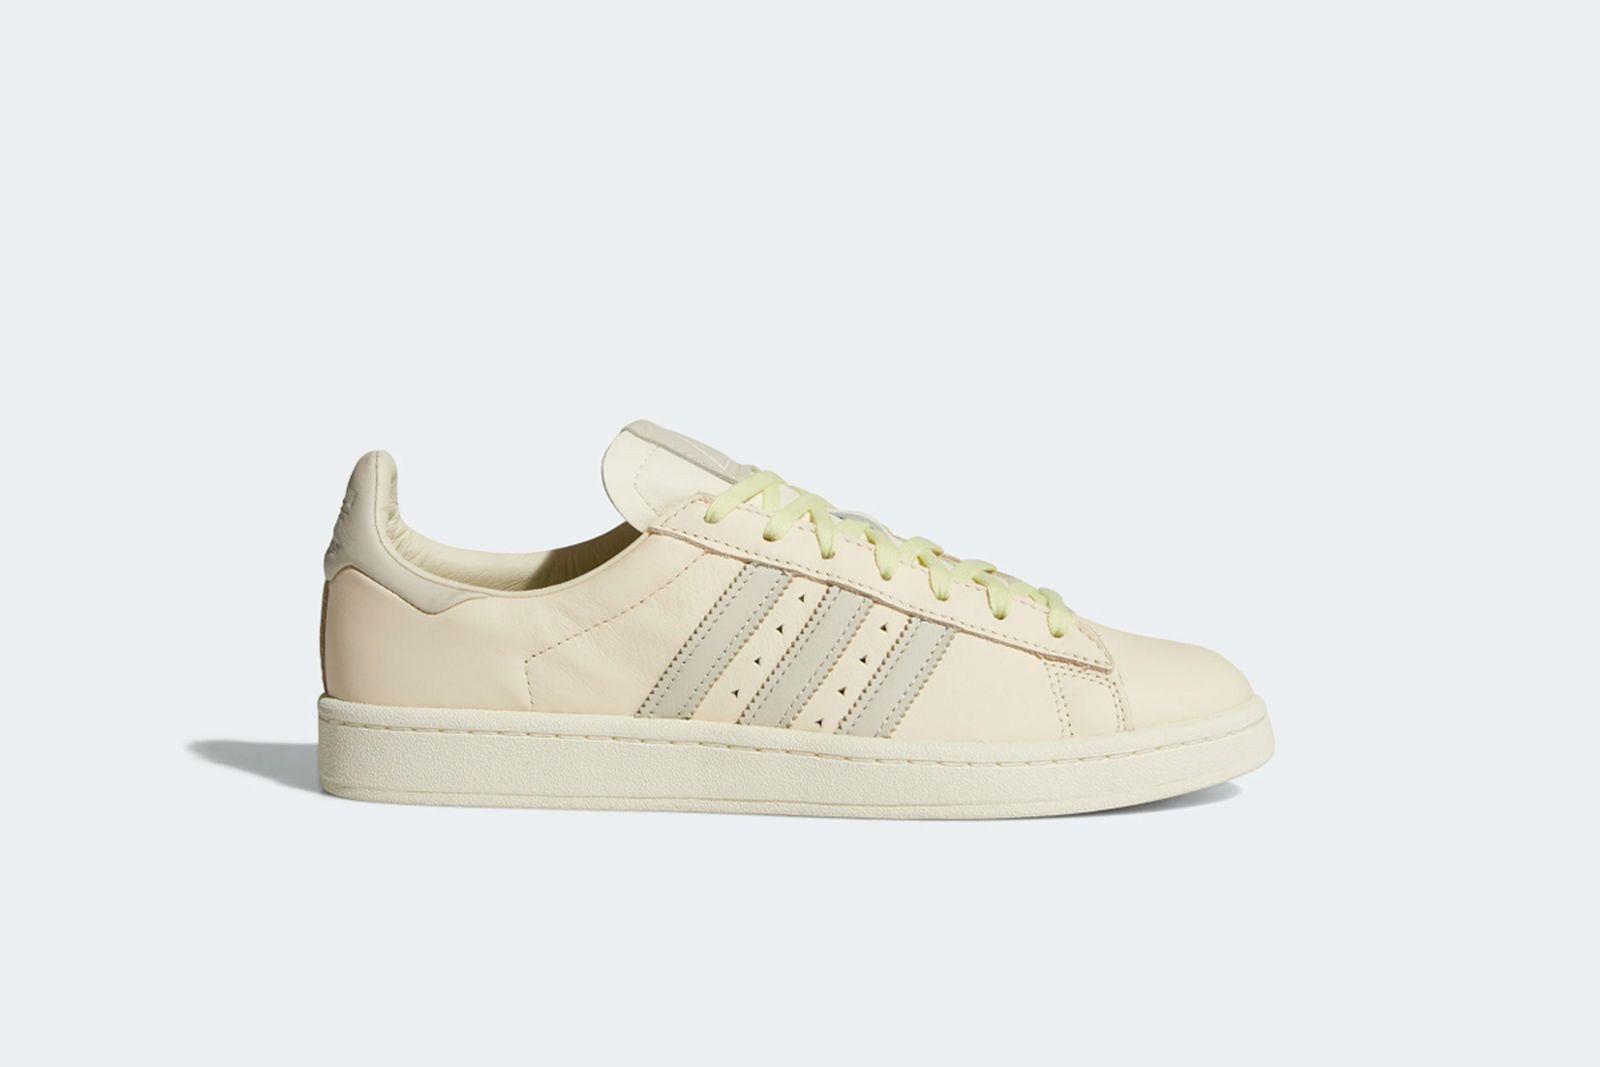 Pharrell Williams x Adidas 2020 Campus Sneaker